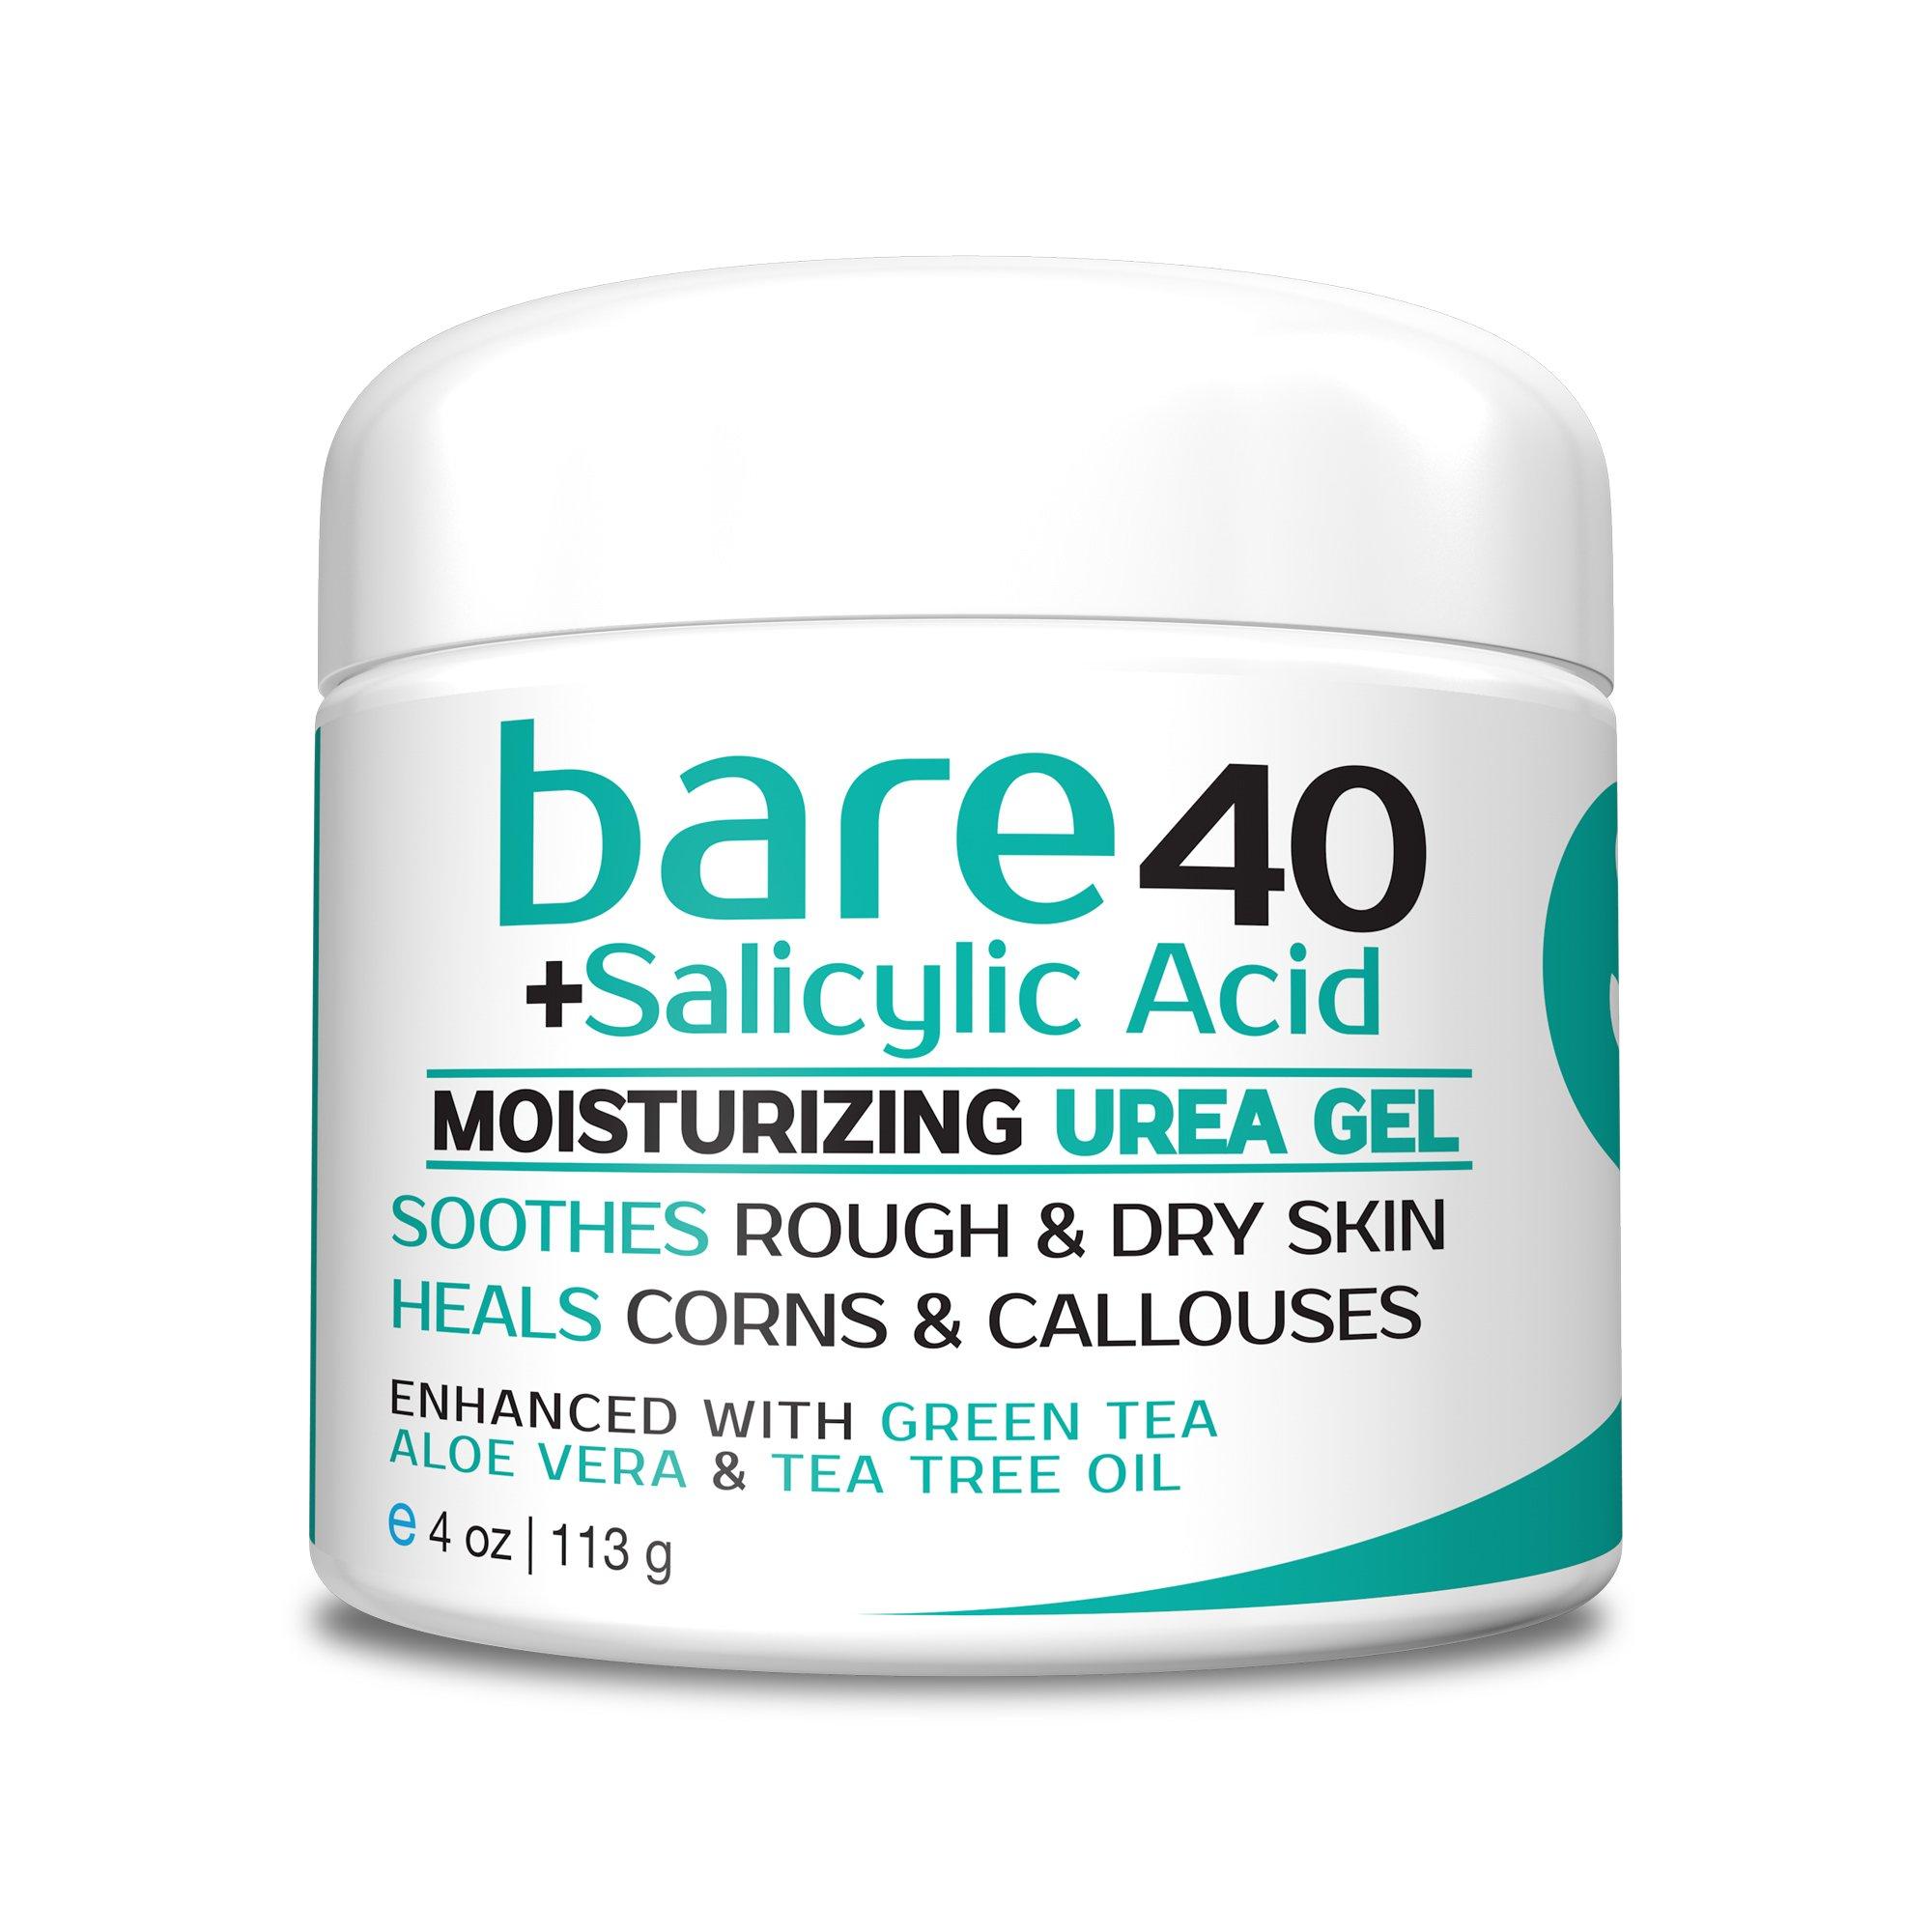 Bare Urea 40% Percent Plus Salicylic Acid Cream for Hands, Feet, Elbows and Knees - Corn & Callus Remover - Skin Exfoliator & Moisturizer - Repairs Thick, Callused Dead & Dry Skin